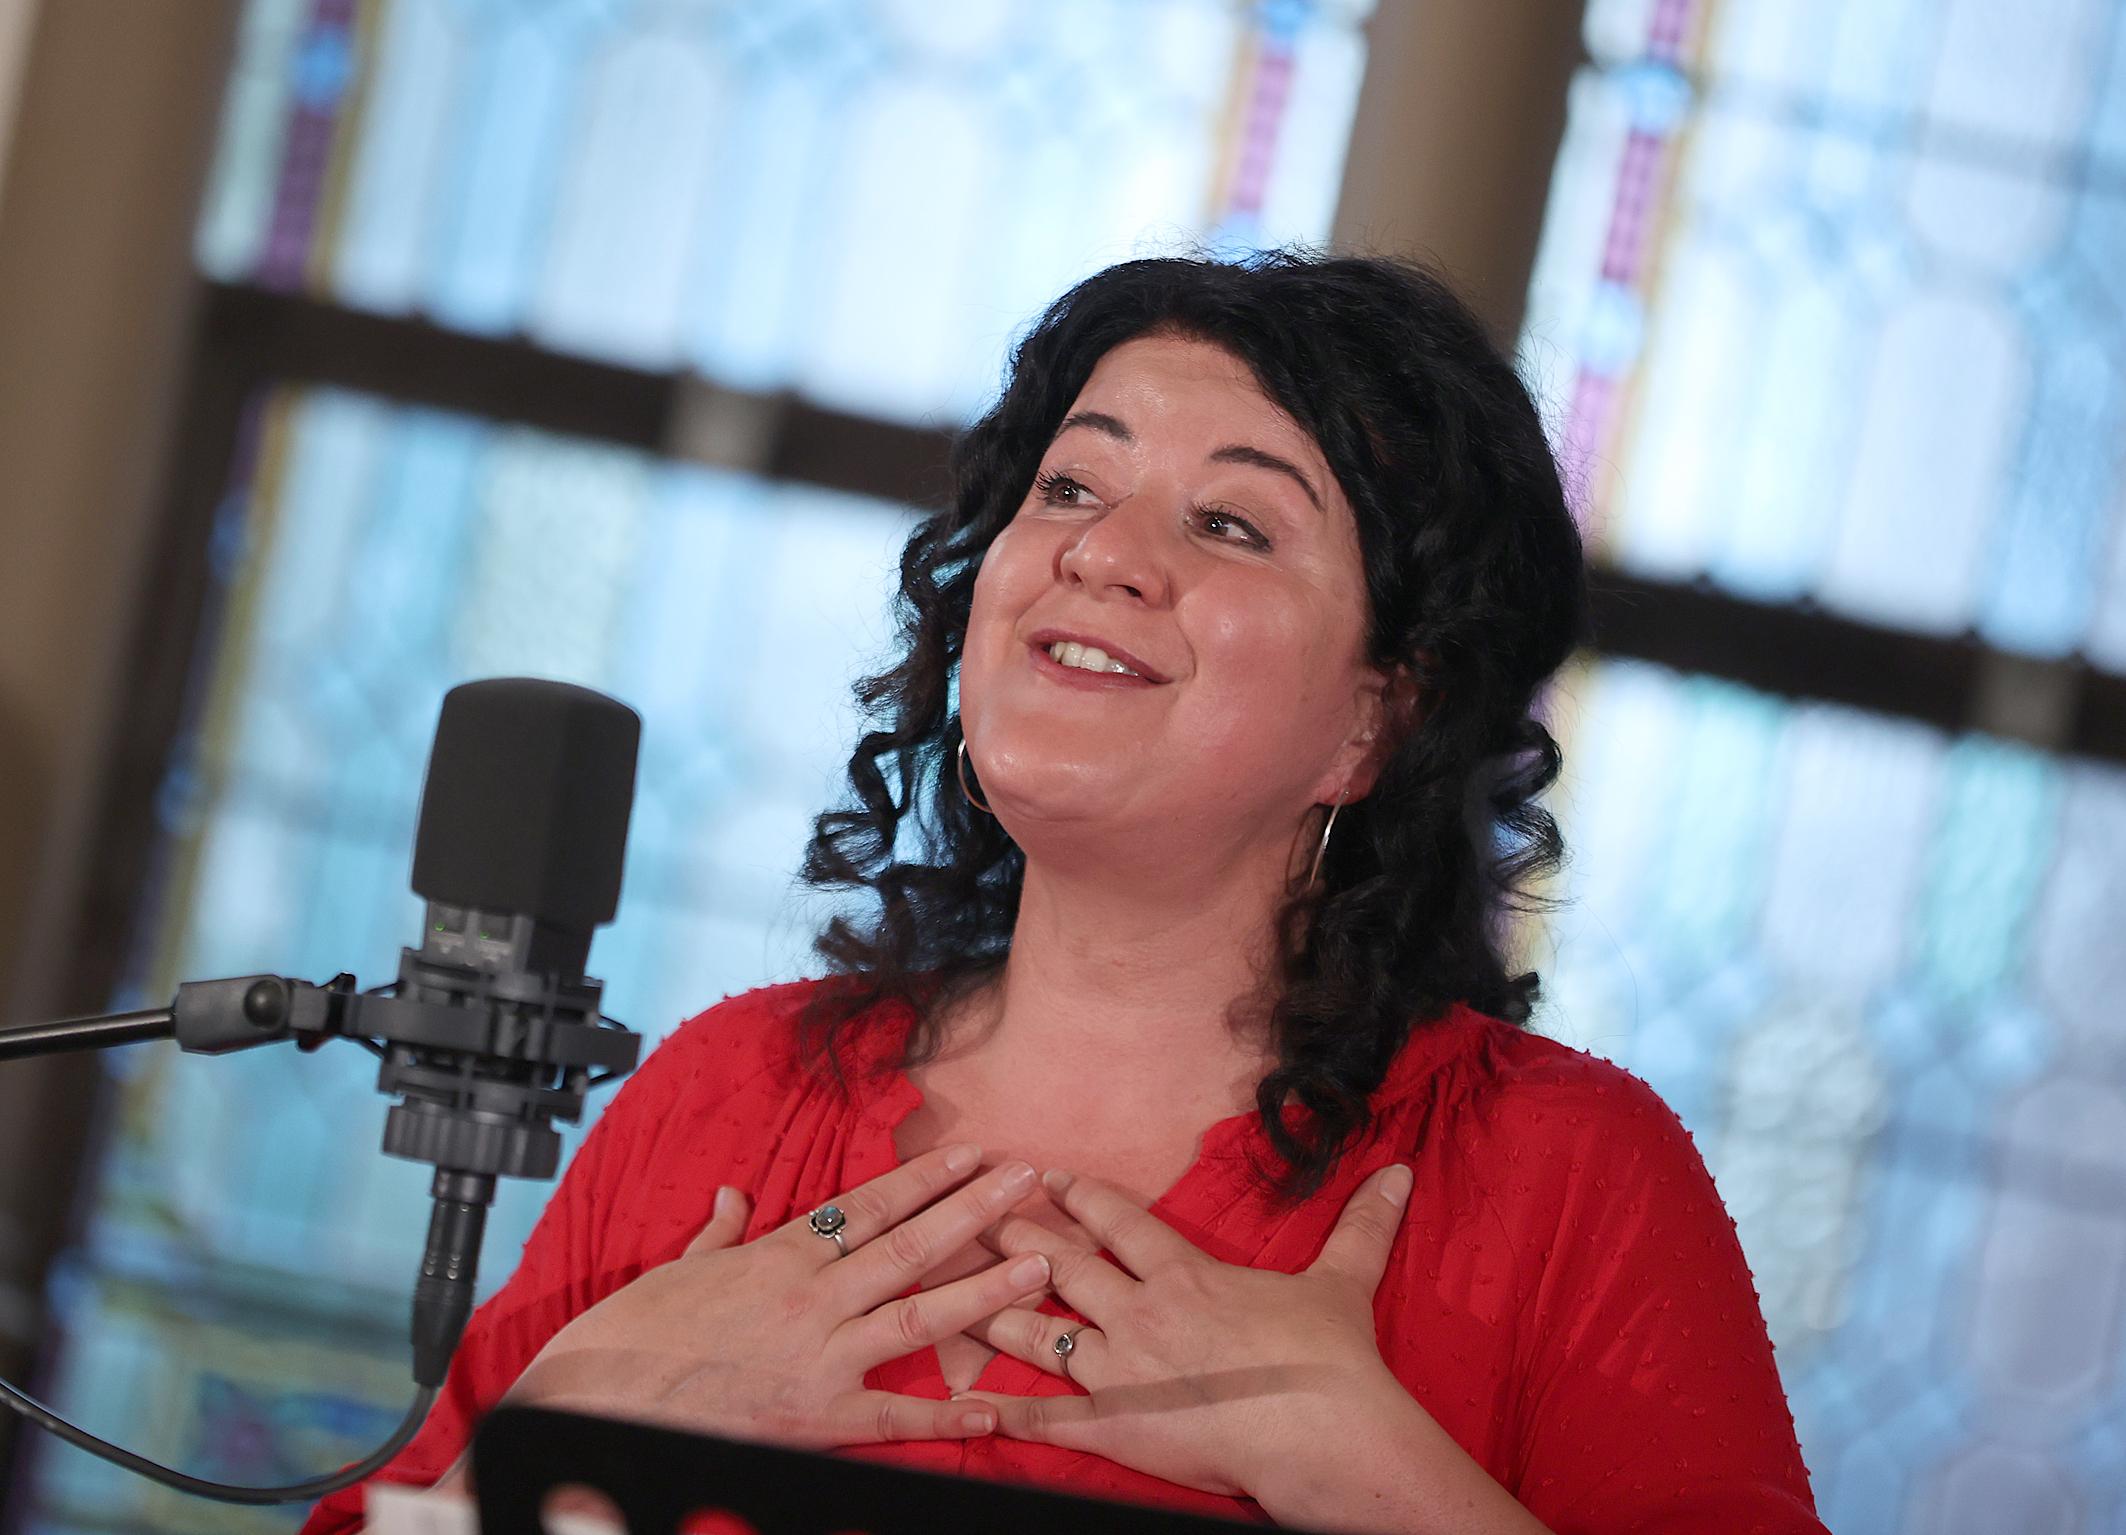 29.08.2021 Empfang aus Flensburg Sängerin Moa